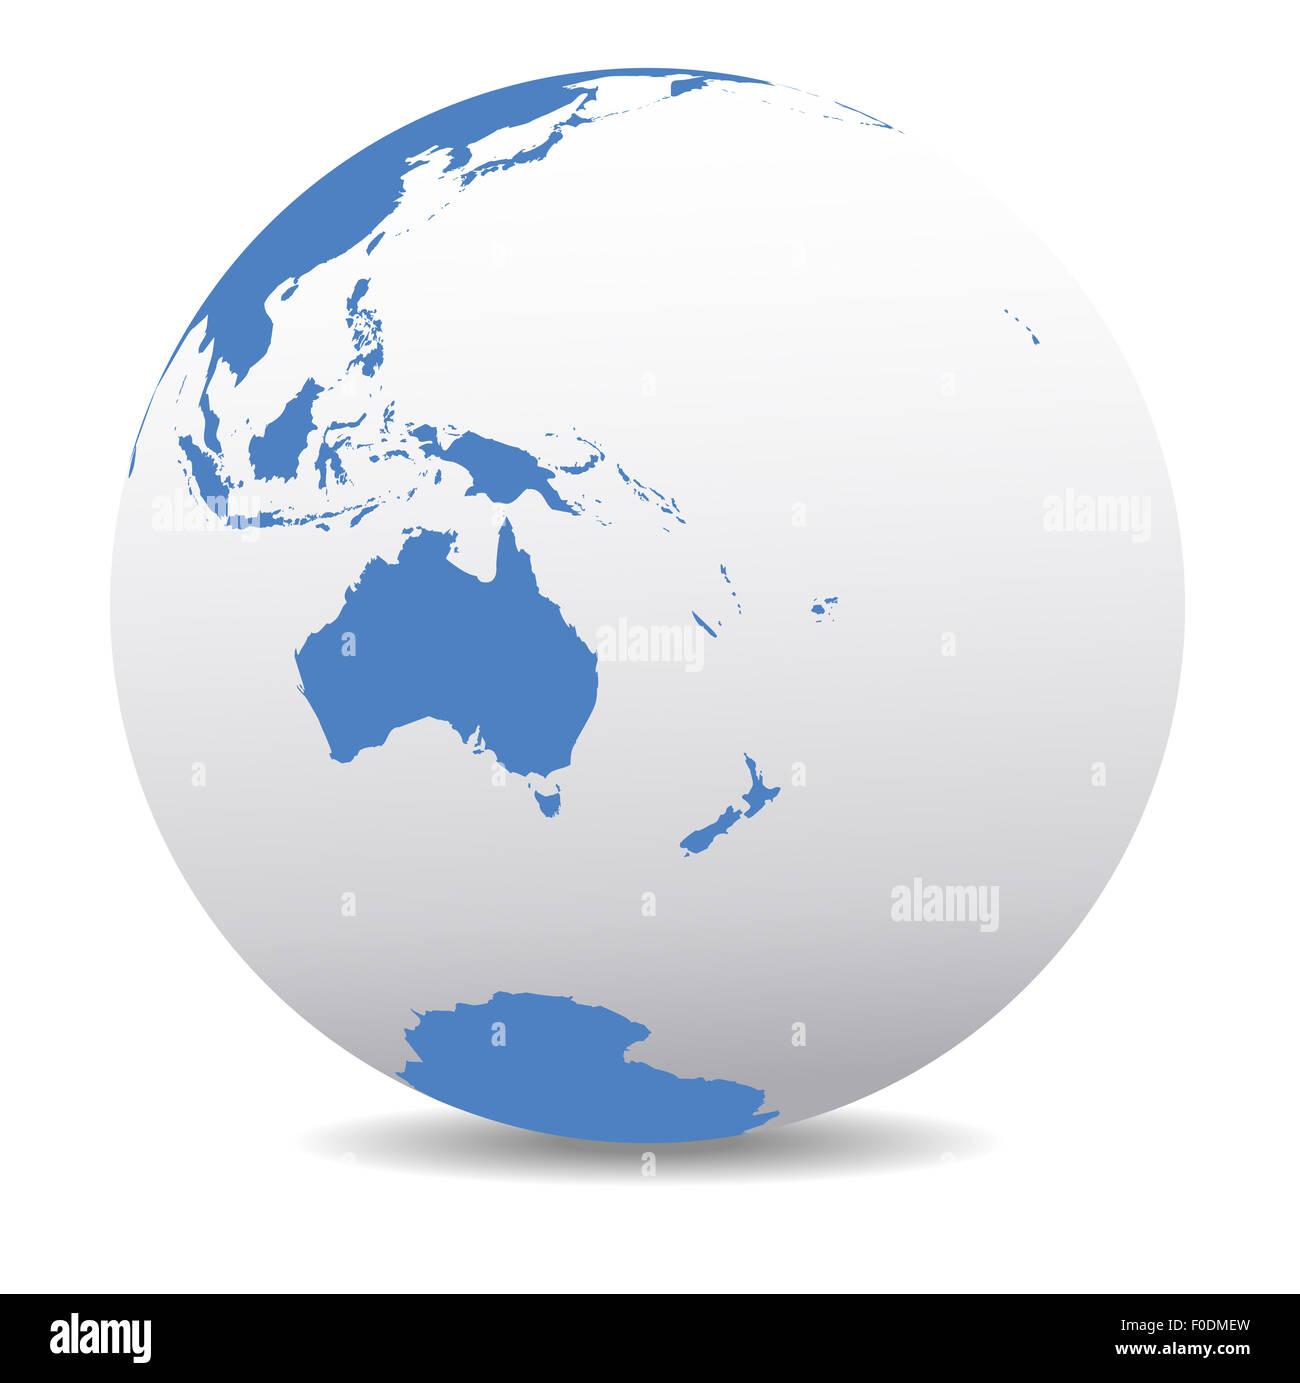 Map Of Australia New Zealand And Papua New Guinea.World Globe Australia New Zealand Papua New Guinea Stock Photo